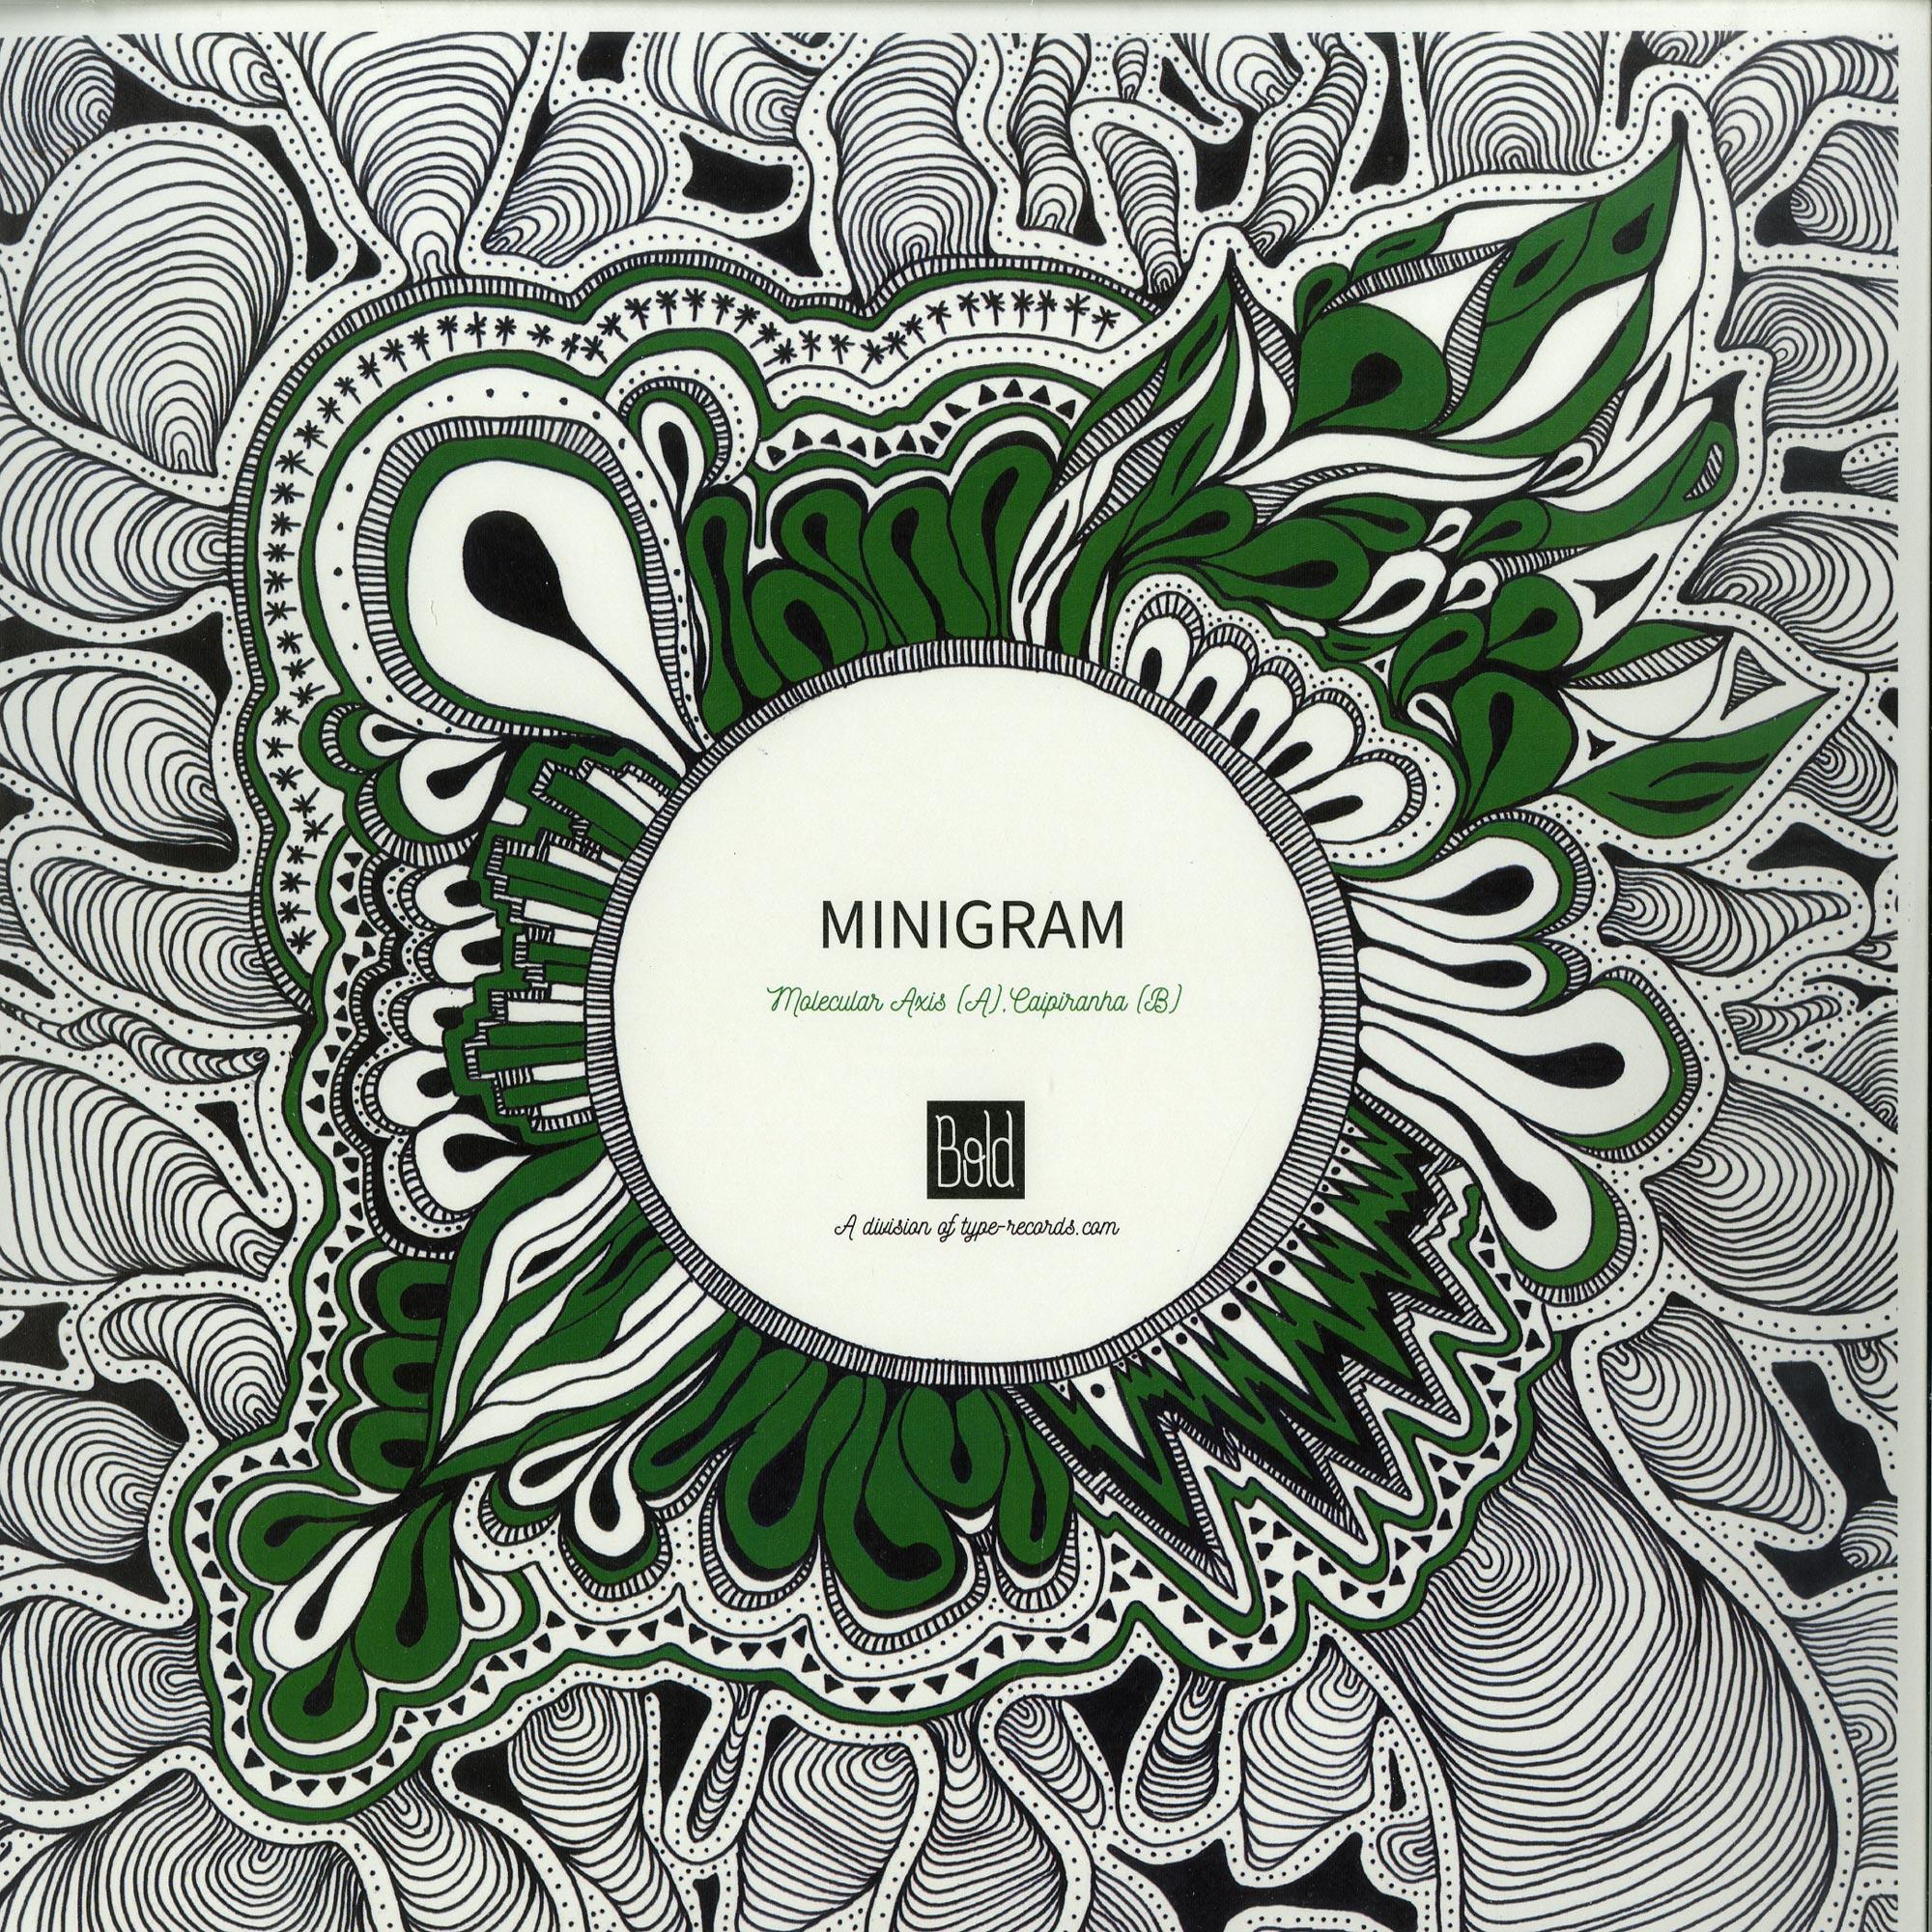 Minigram - MOLECULAR AXIS